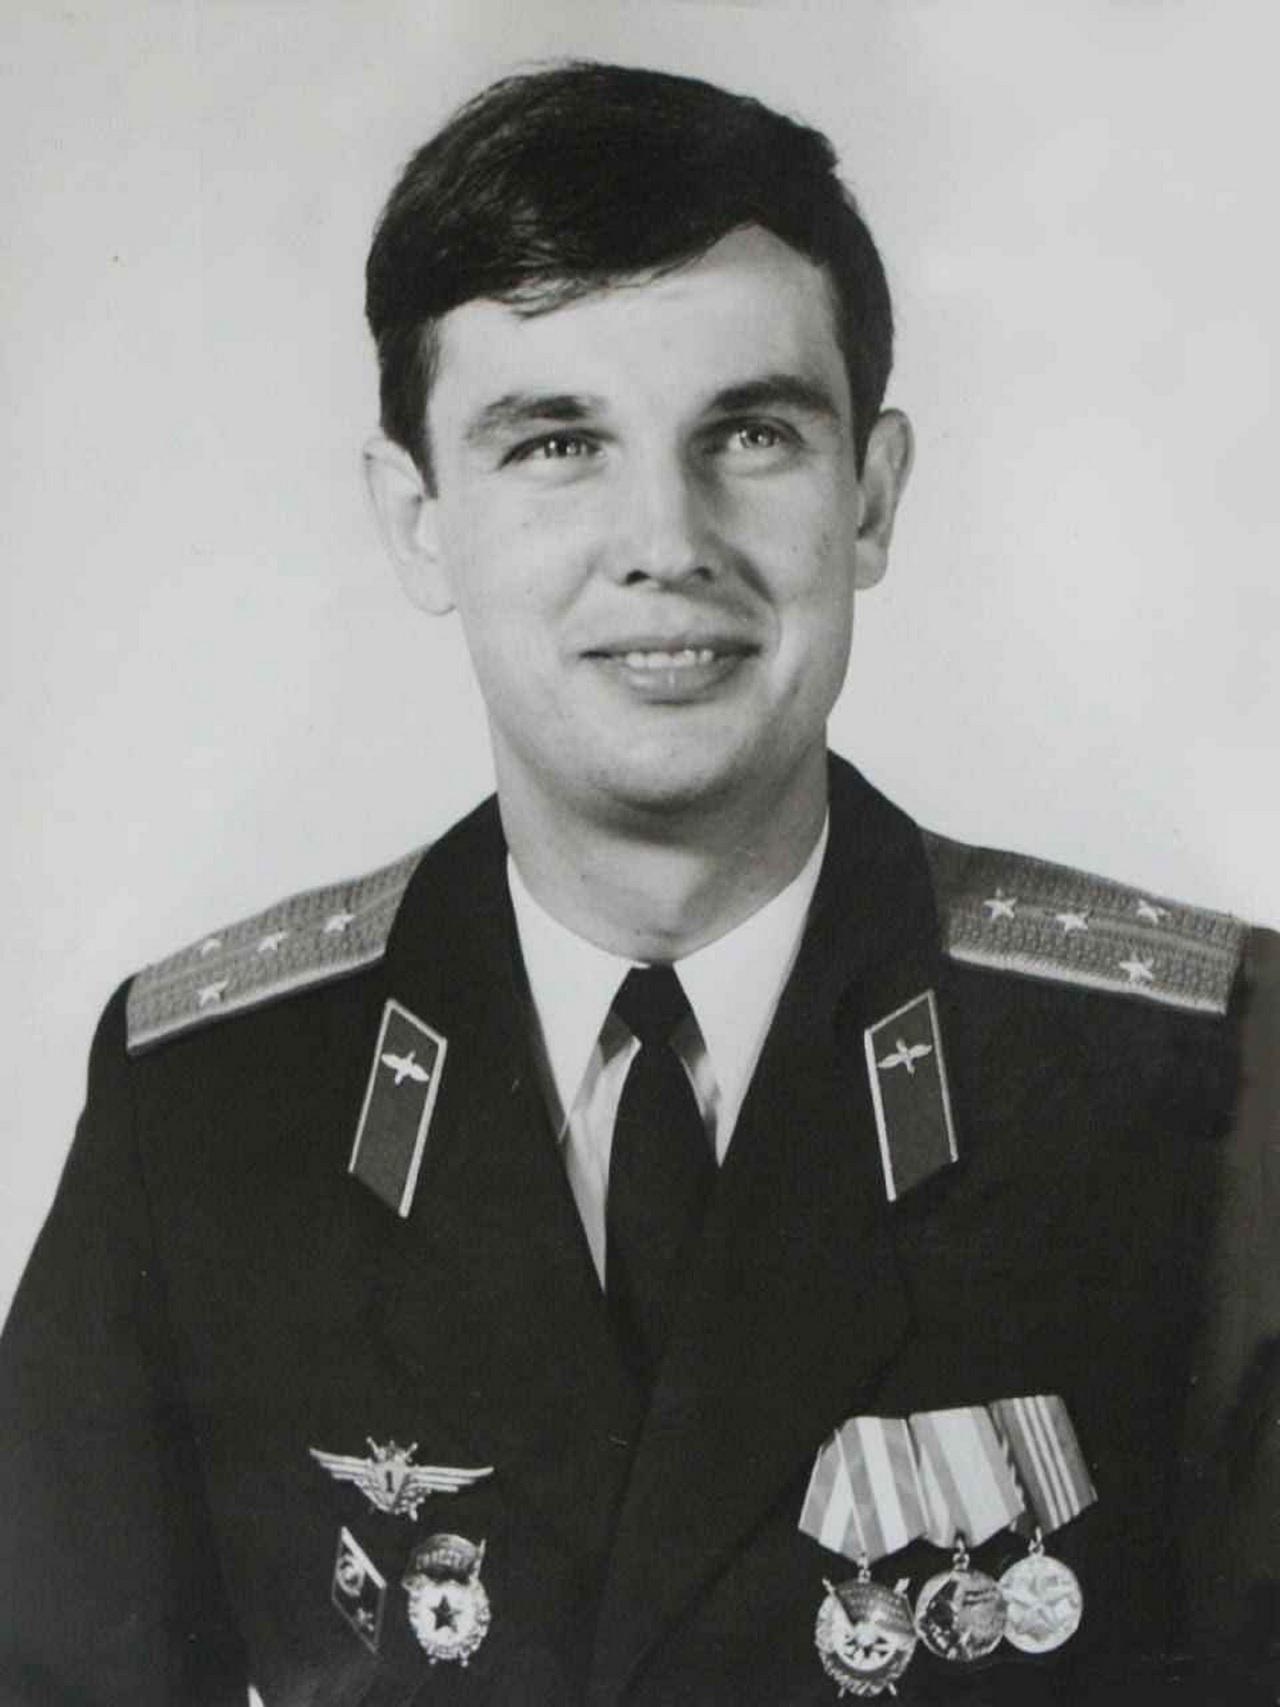 Замполит эскадрильи капитан Валентин Куляпин.